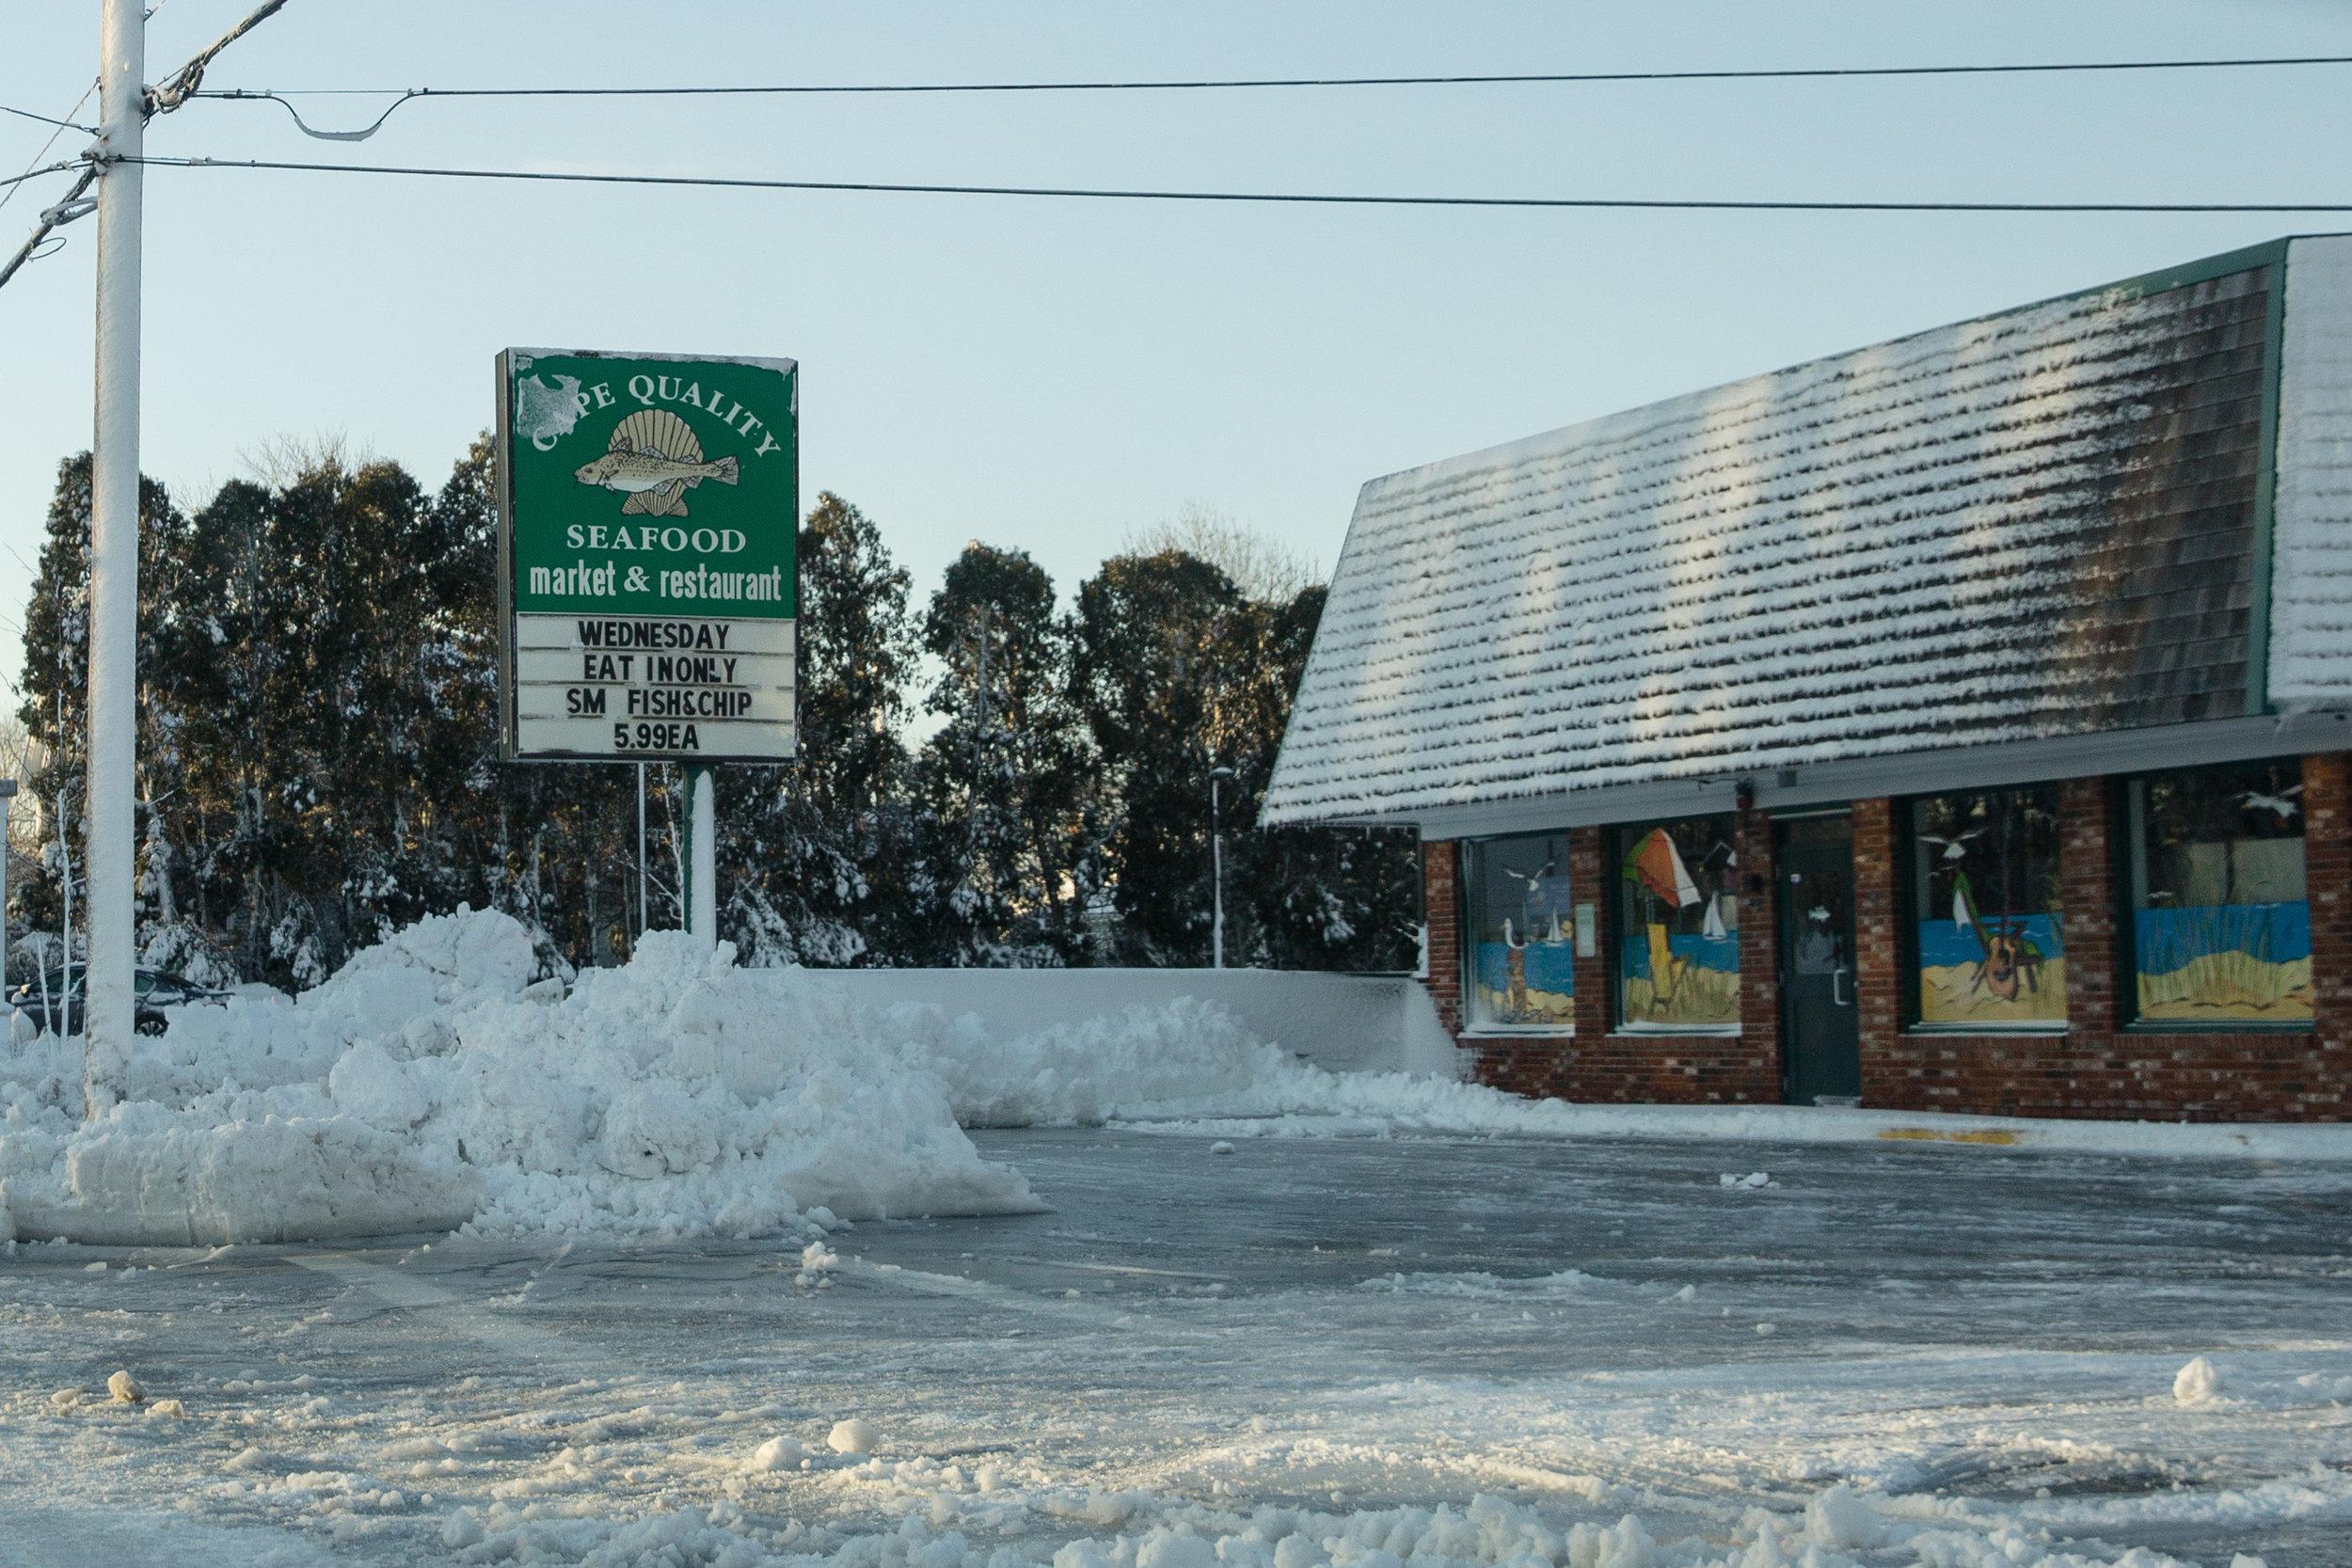 Cape Quality snowdrifts. - Dartmouth, MA